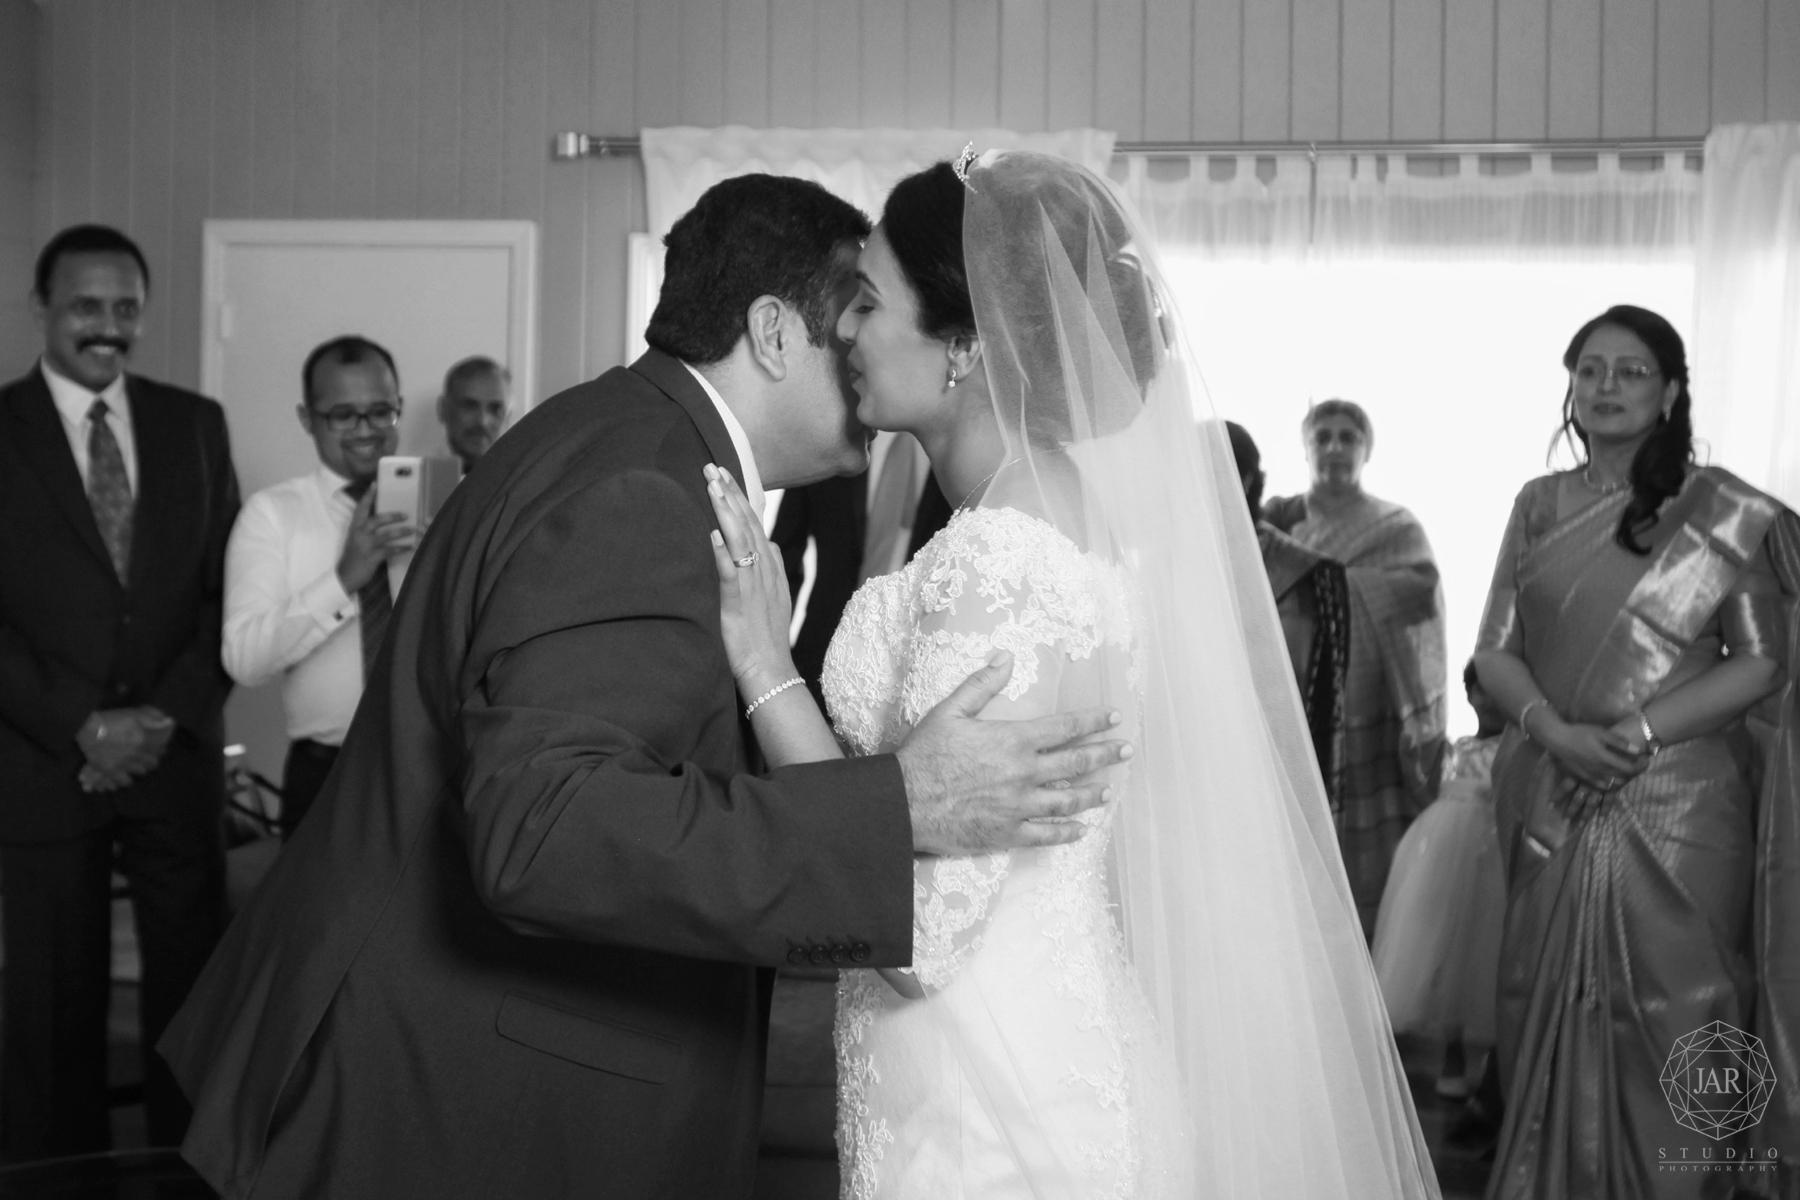 09-orlando-indian-wedding-traditions-beautiful-jarstudio-photography.jpg